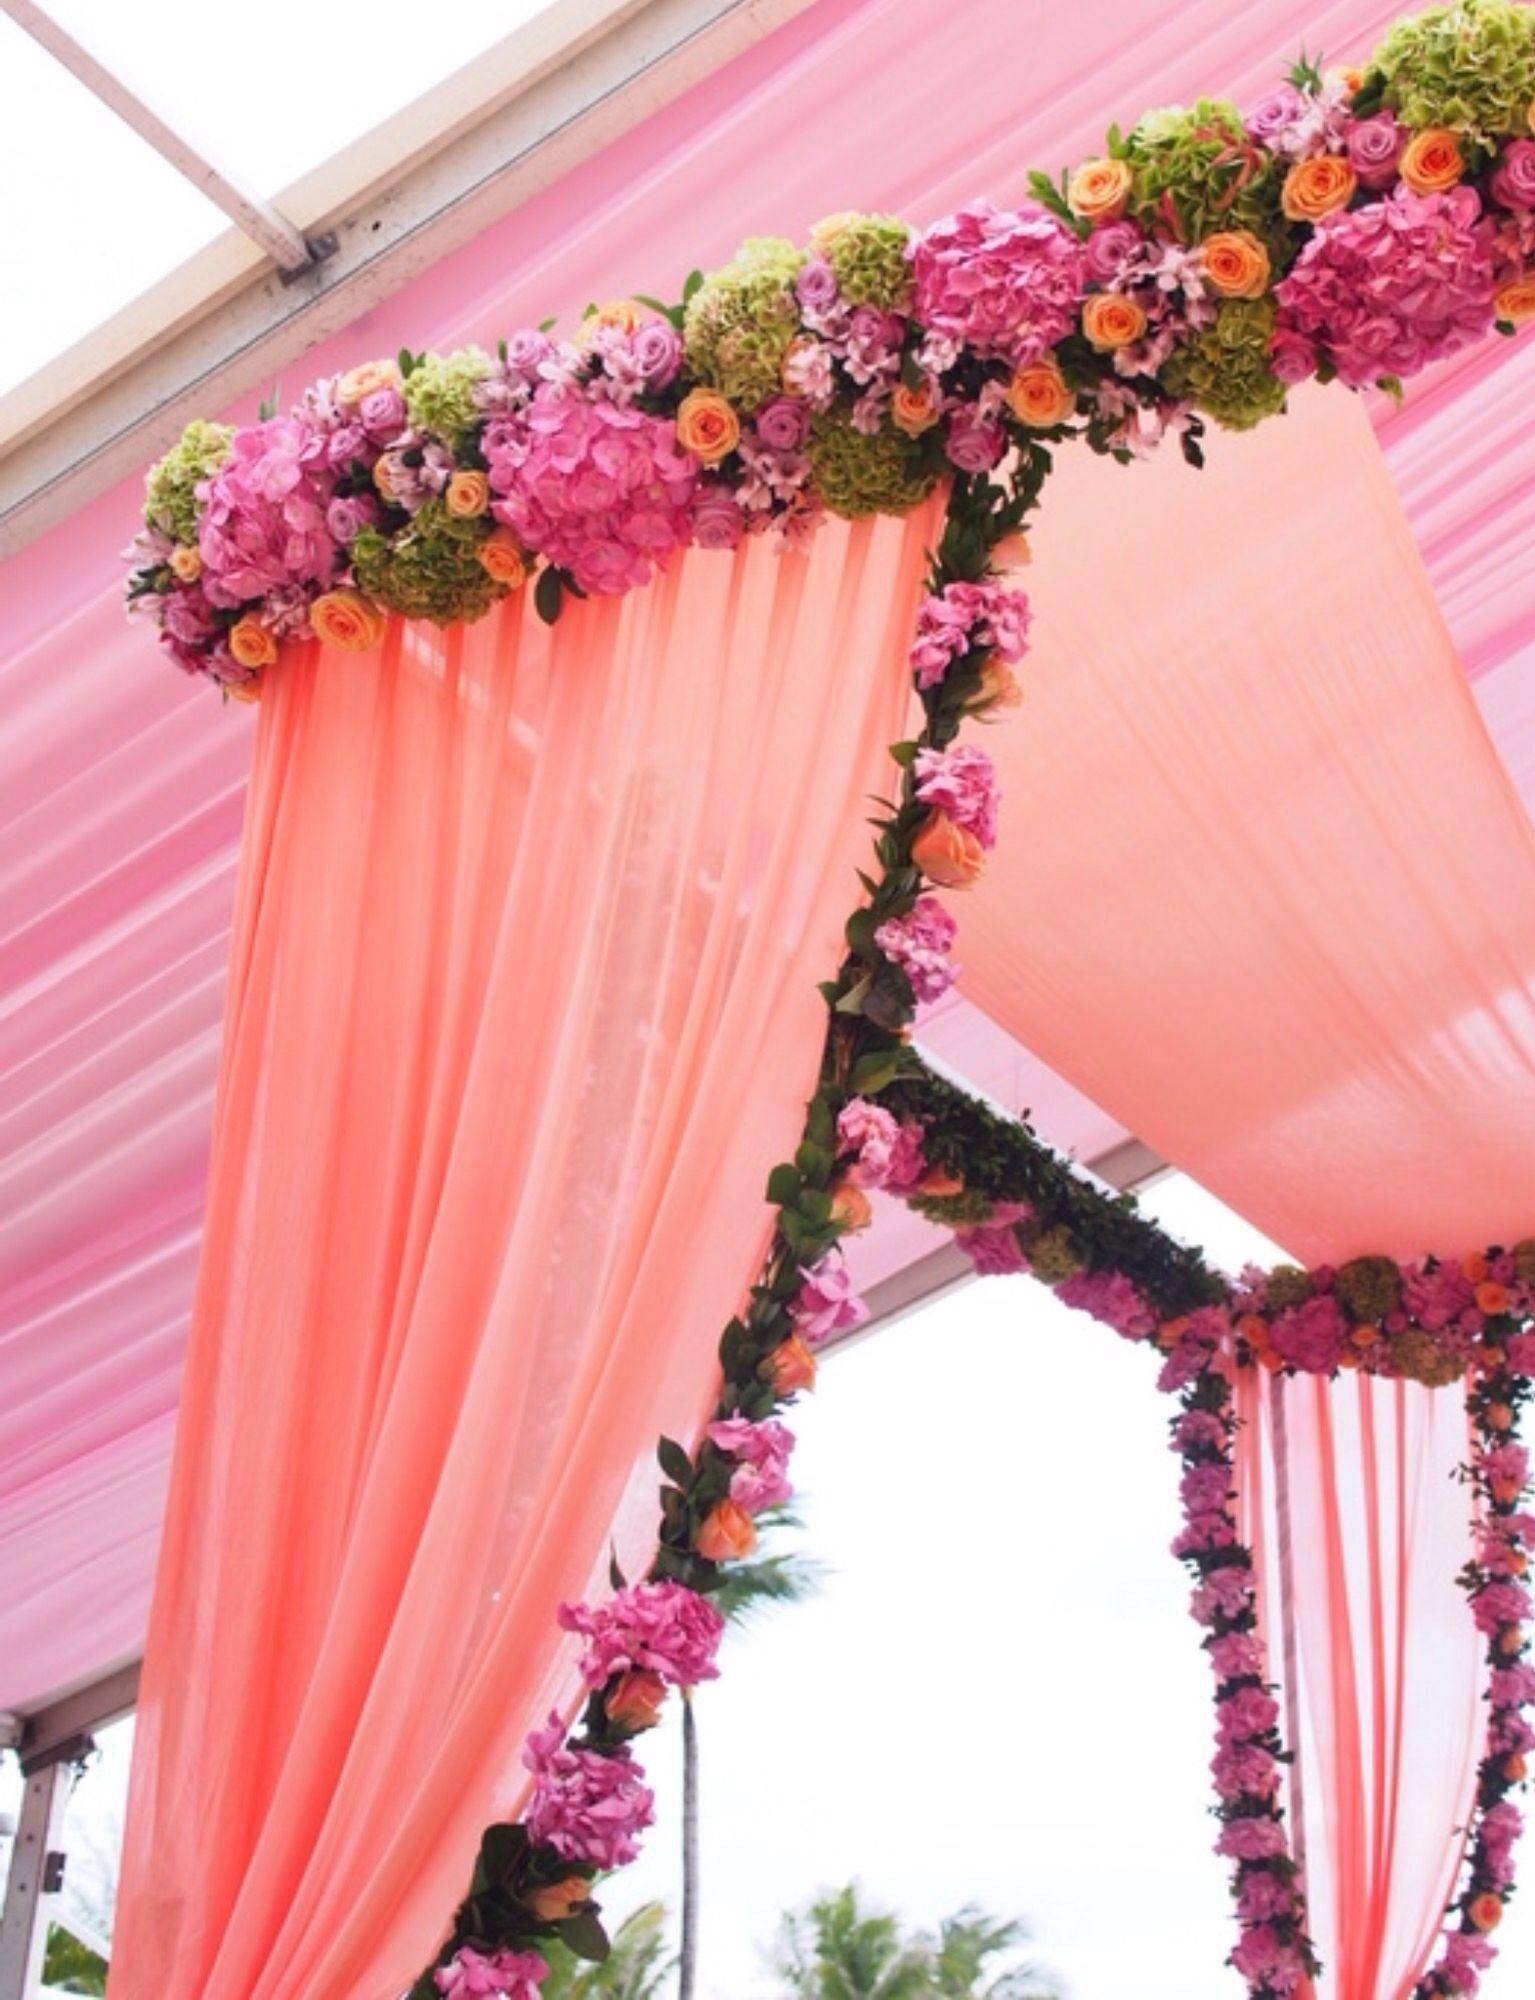 Wedding mandap decoration ideas  Pin by ankita bandrapalli on Weddings  Pinterest  Wedding mandap